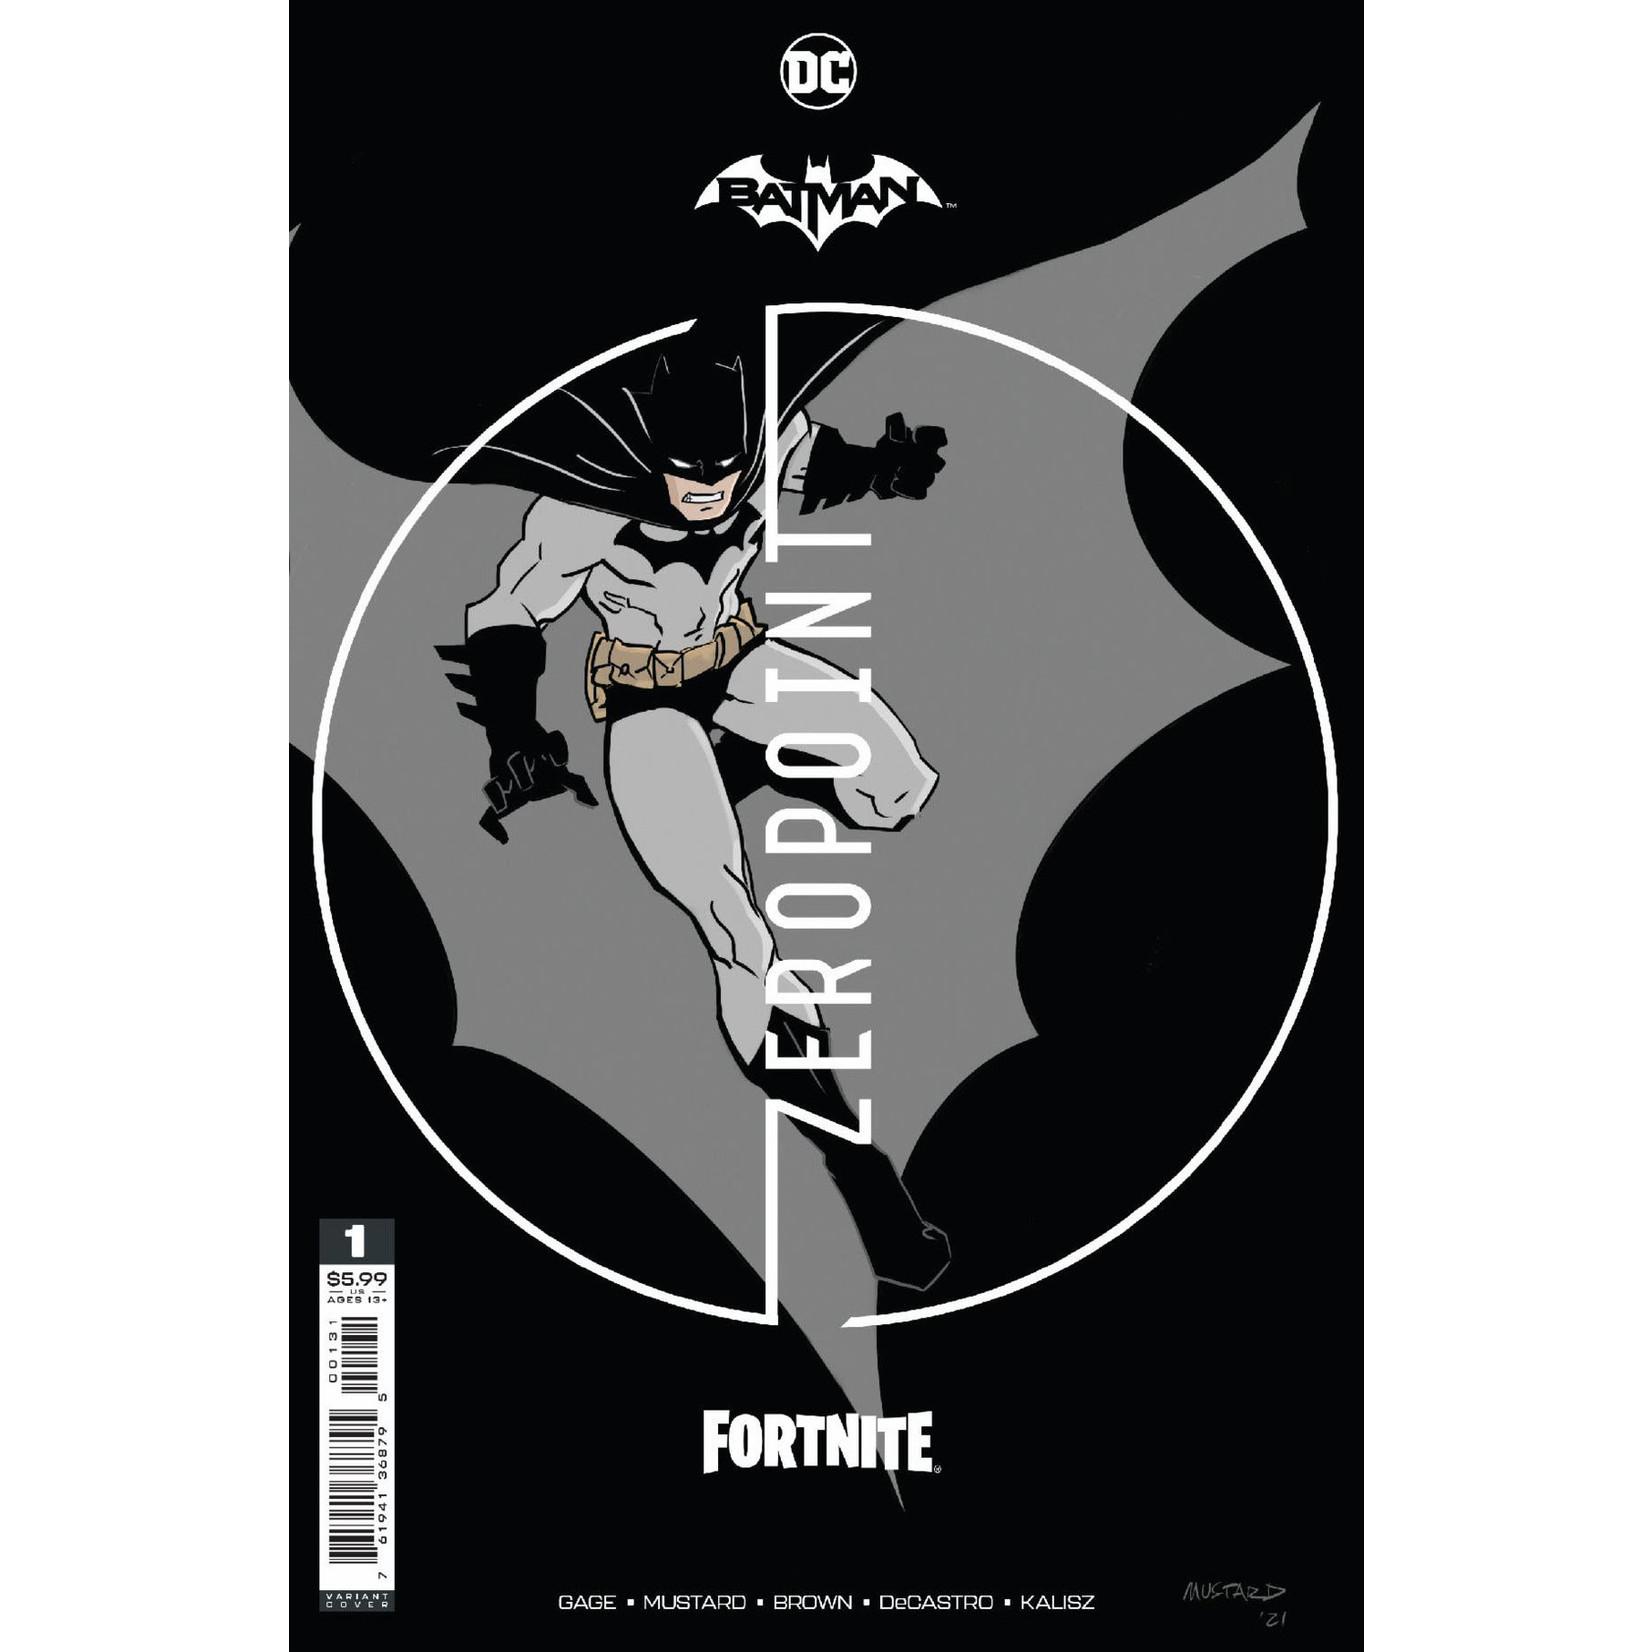 DC COMICS Batman Fortnite Zero Point #1 Premium Variant A